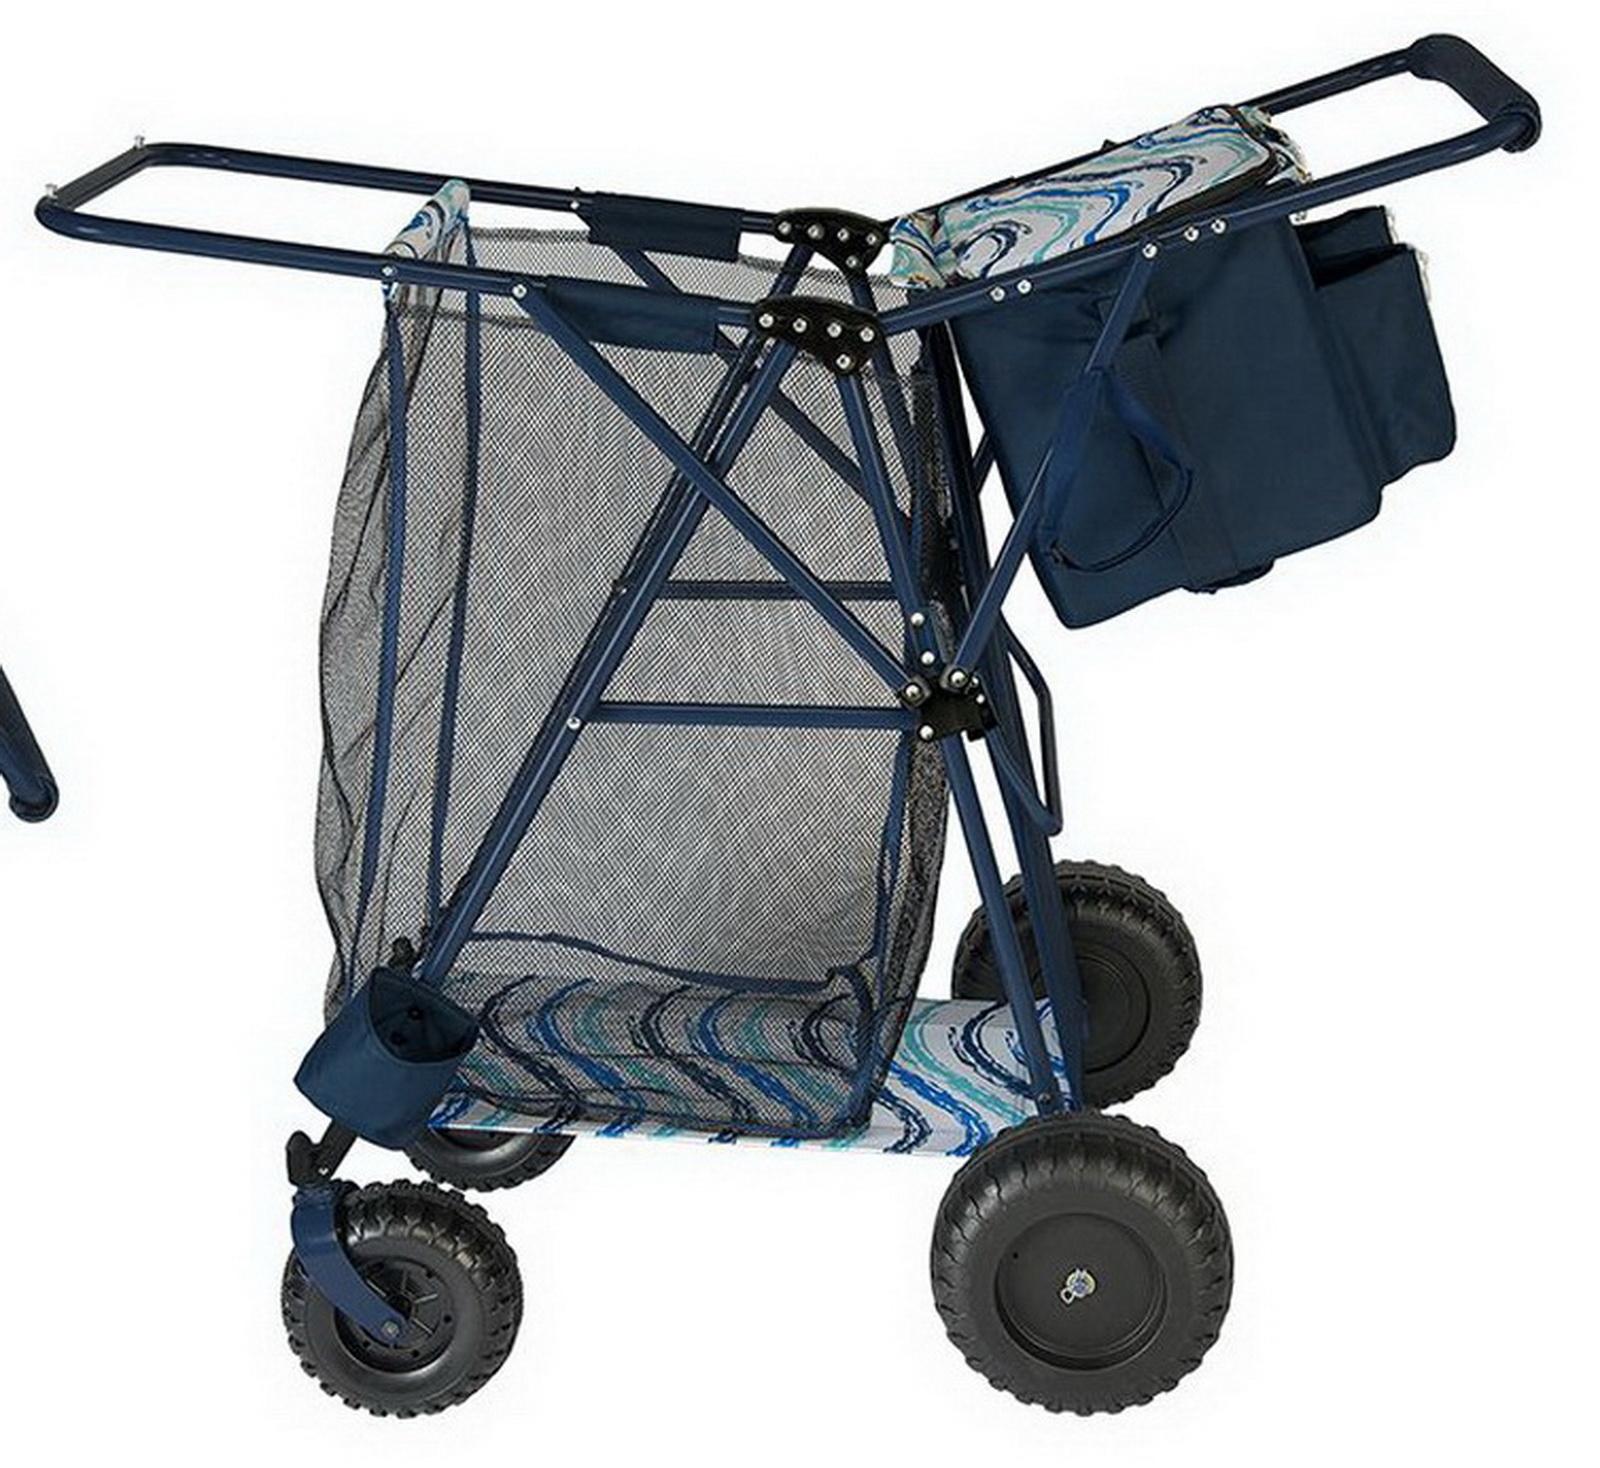 Big Folding Beach Cart  Portable Cooler Shopping Gear Transport Wagon